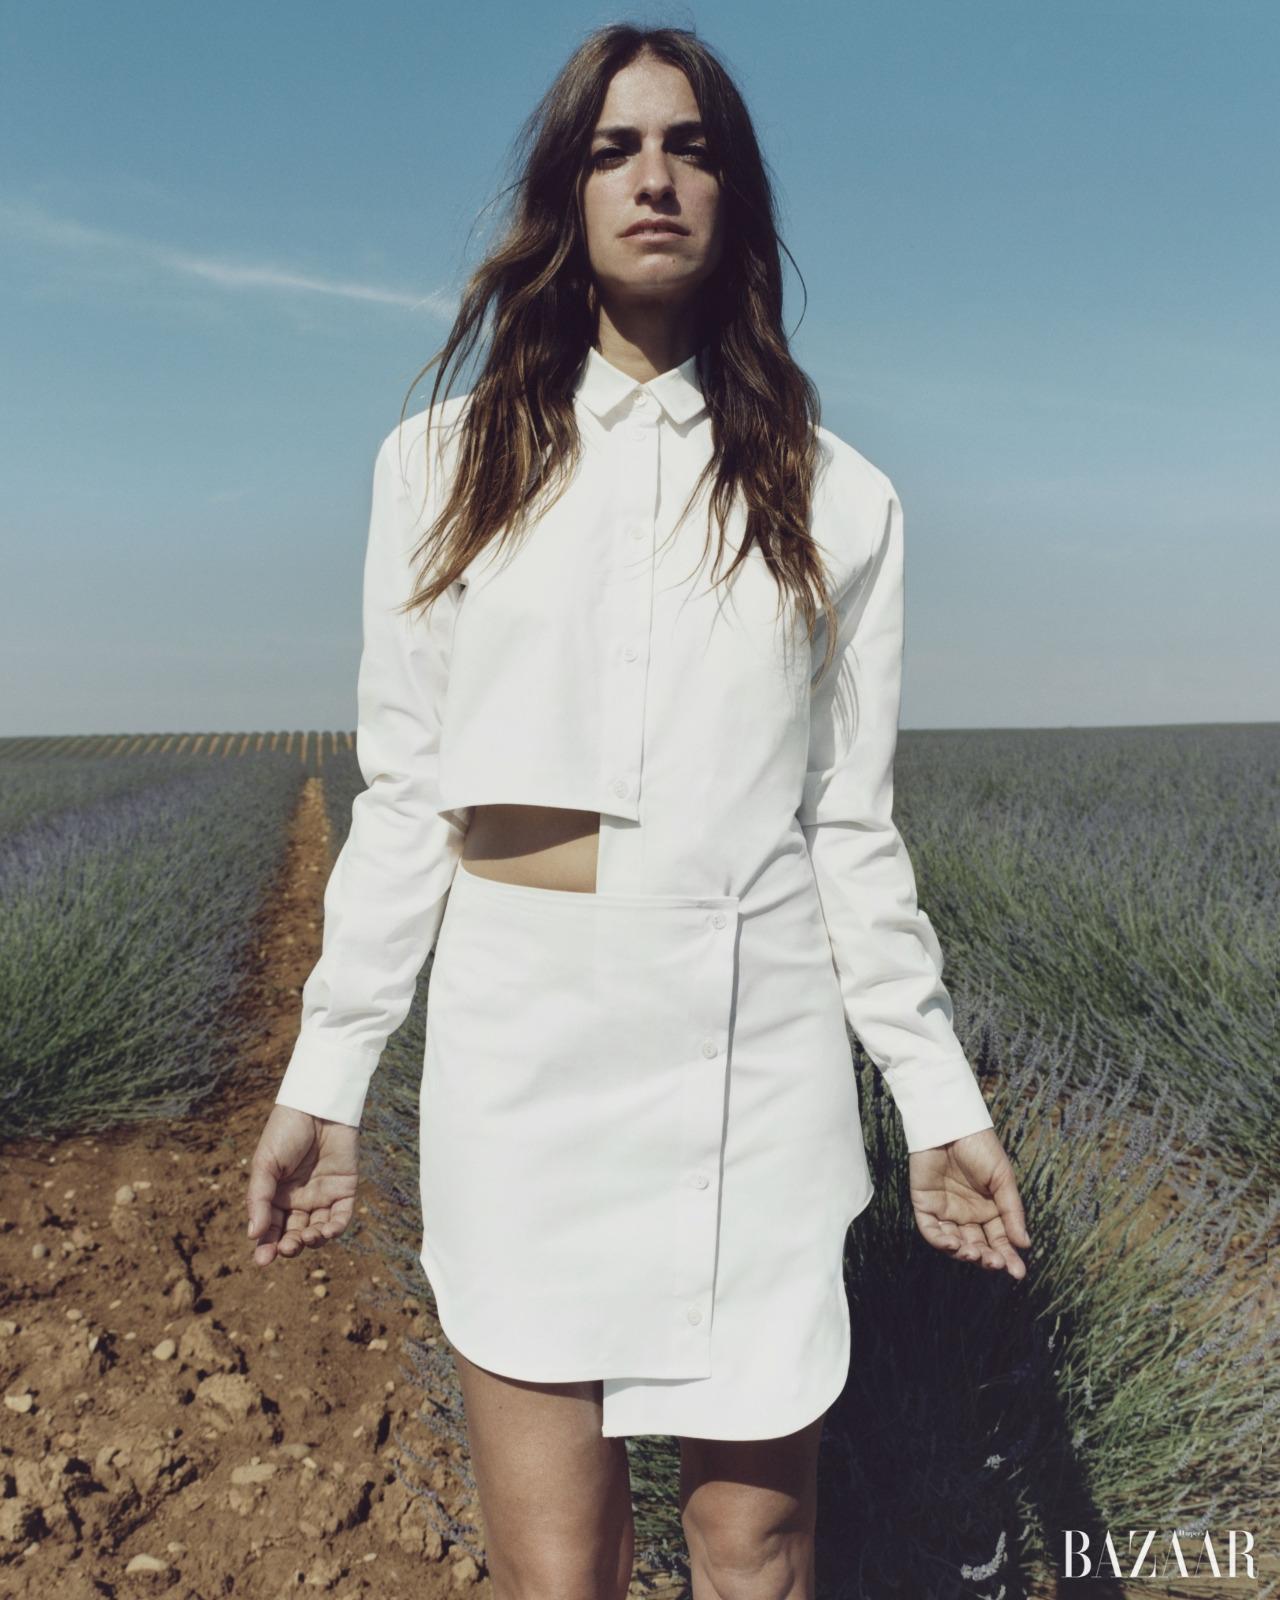 <strong>Joana Preiss</strong> 돌아가신어머니에게 헌정하고자 디자인한자크뮈스 2016 리조트 컬렉션의뮤즈로 프랑스 배우 조아나프레이스를 택했다.